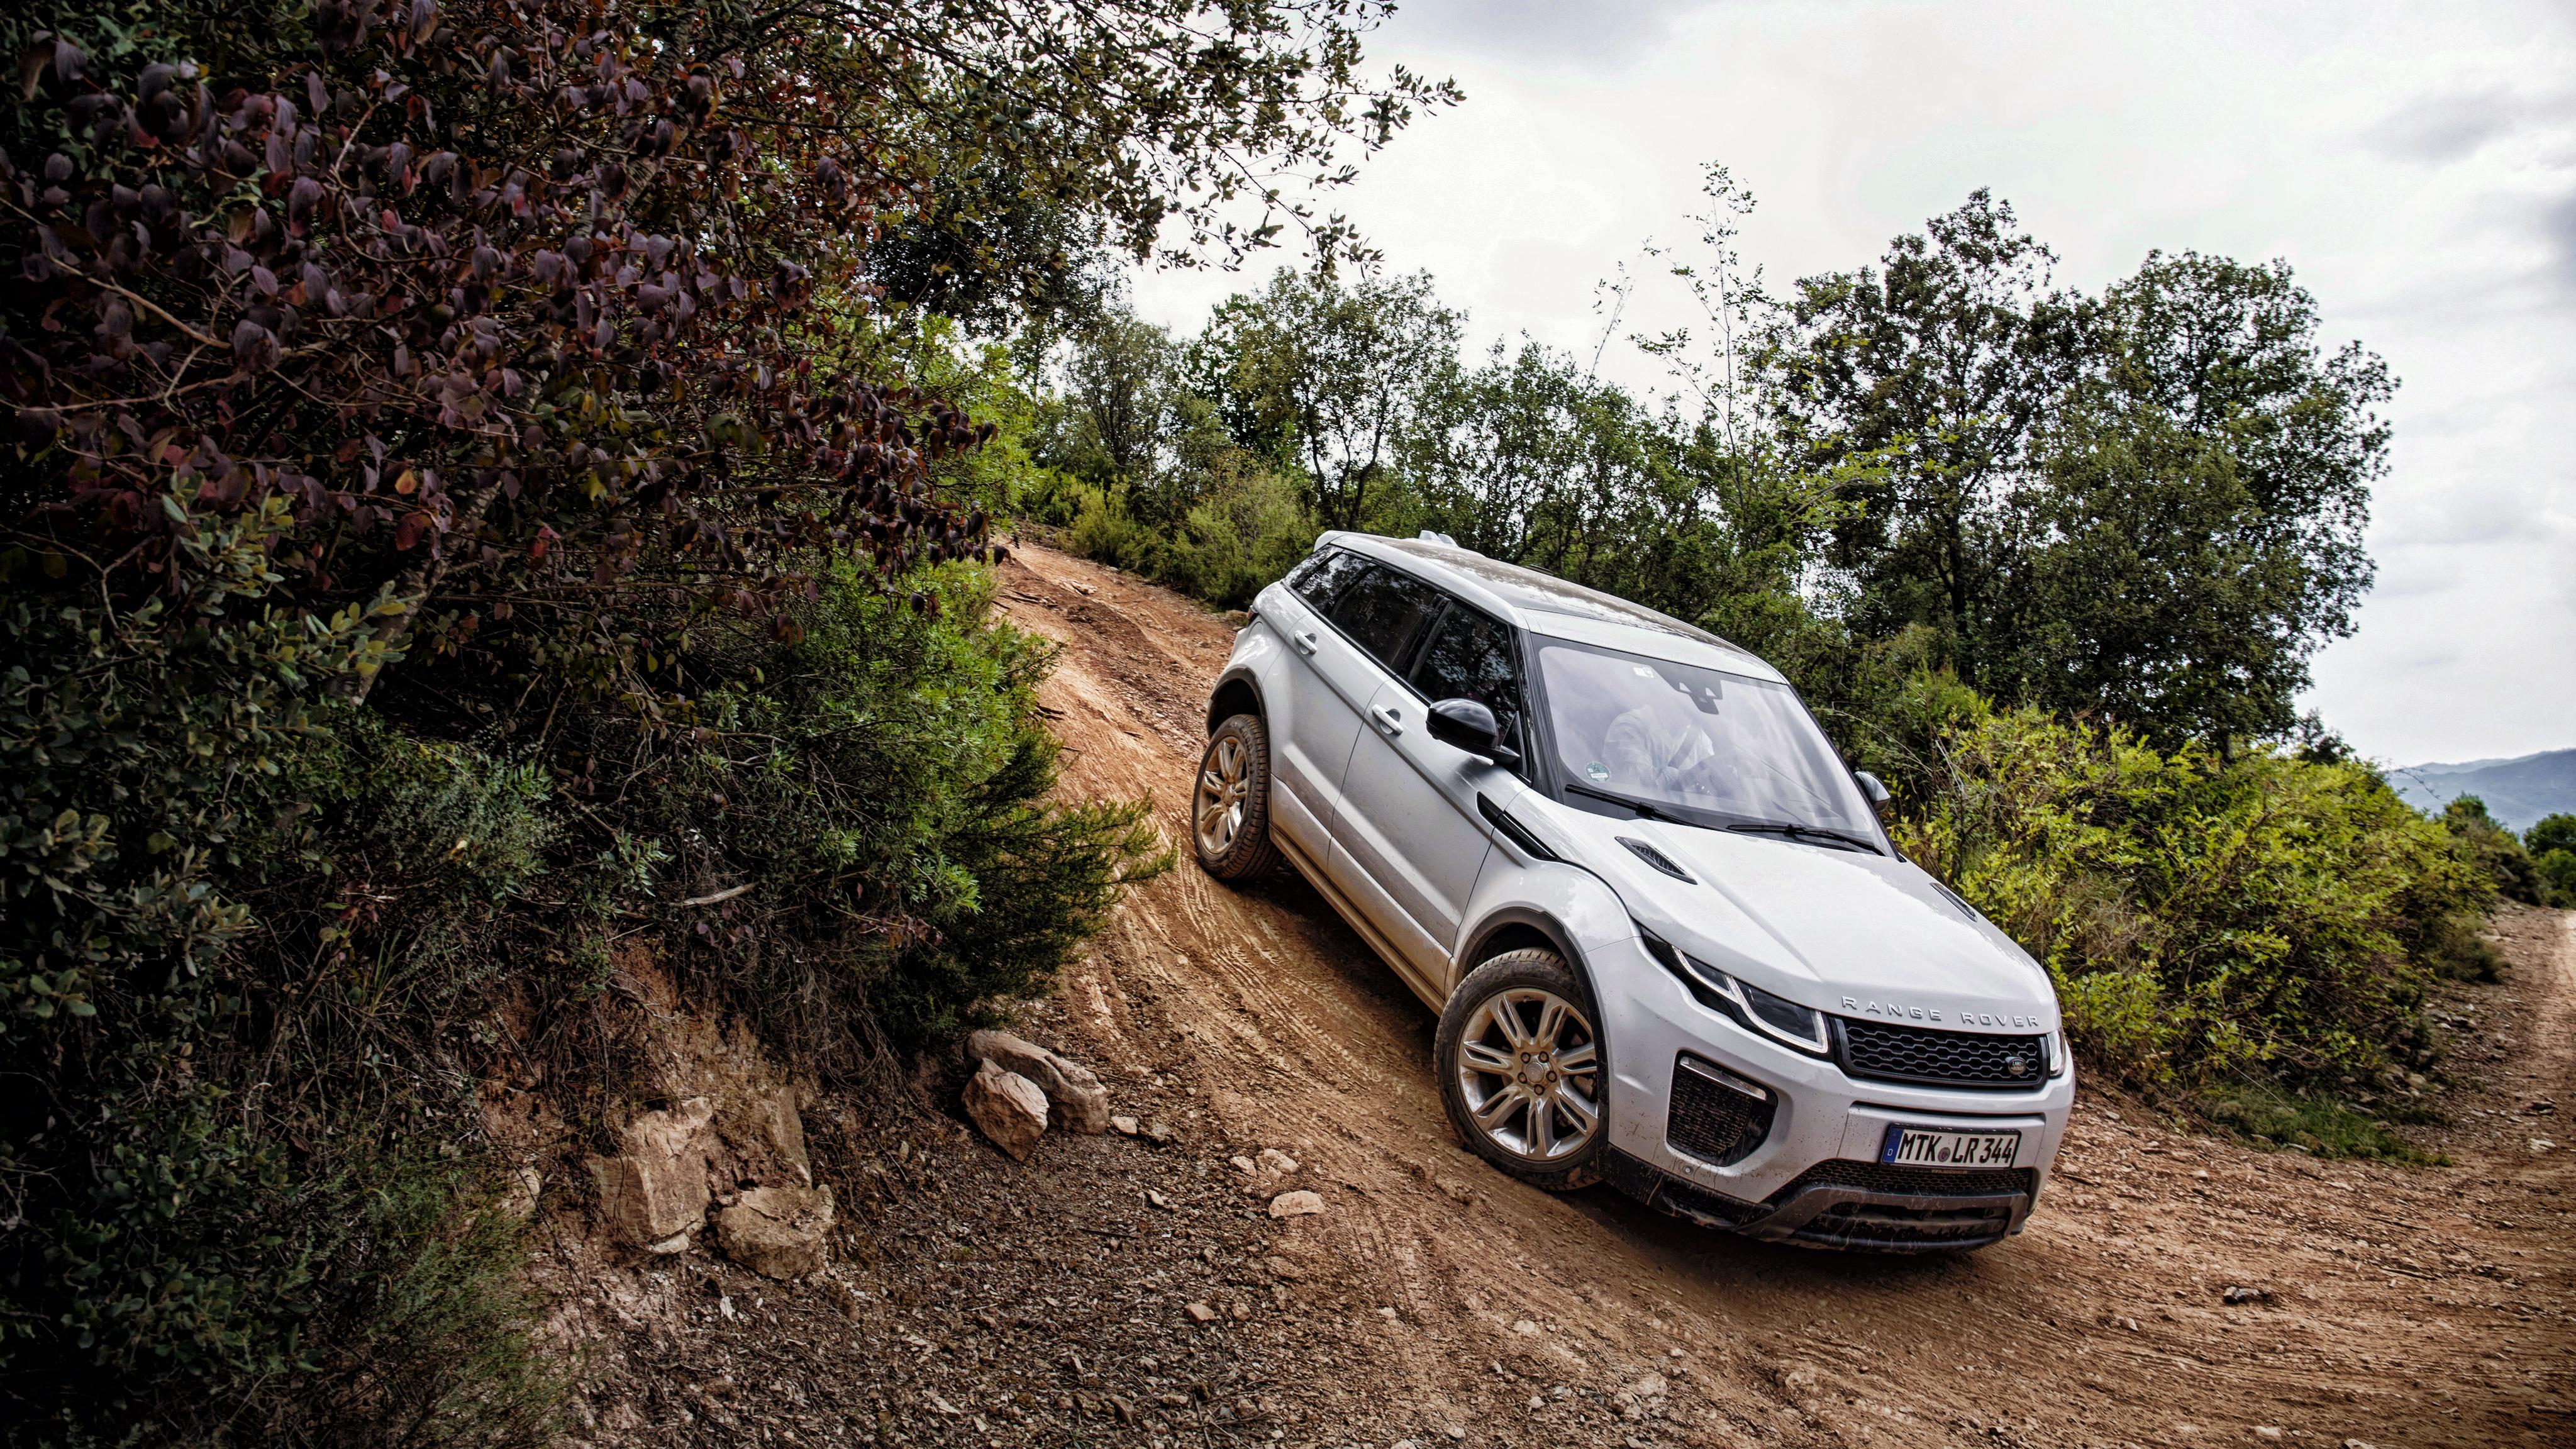 65006 скачать обои Тачки (Cars), Ленд Ровер (Land Rover), Рендж Ровер (Range Rover), Evoque, Серебристый, Спуск - заставки и картинки бесплатно